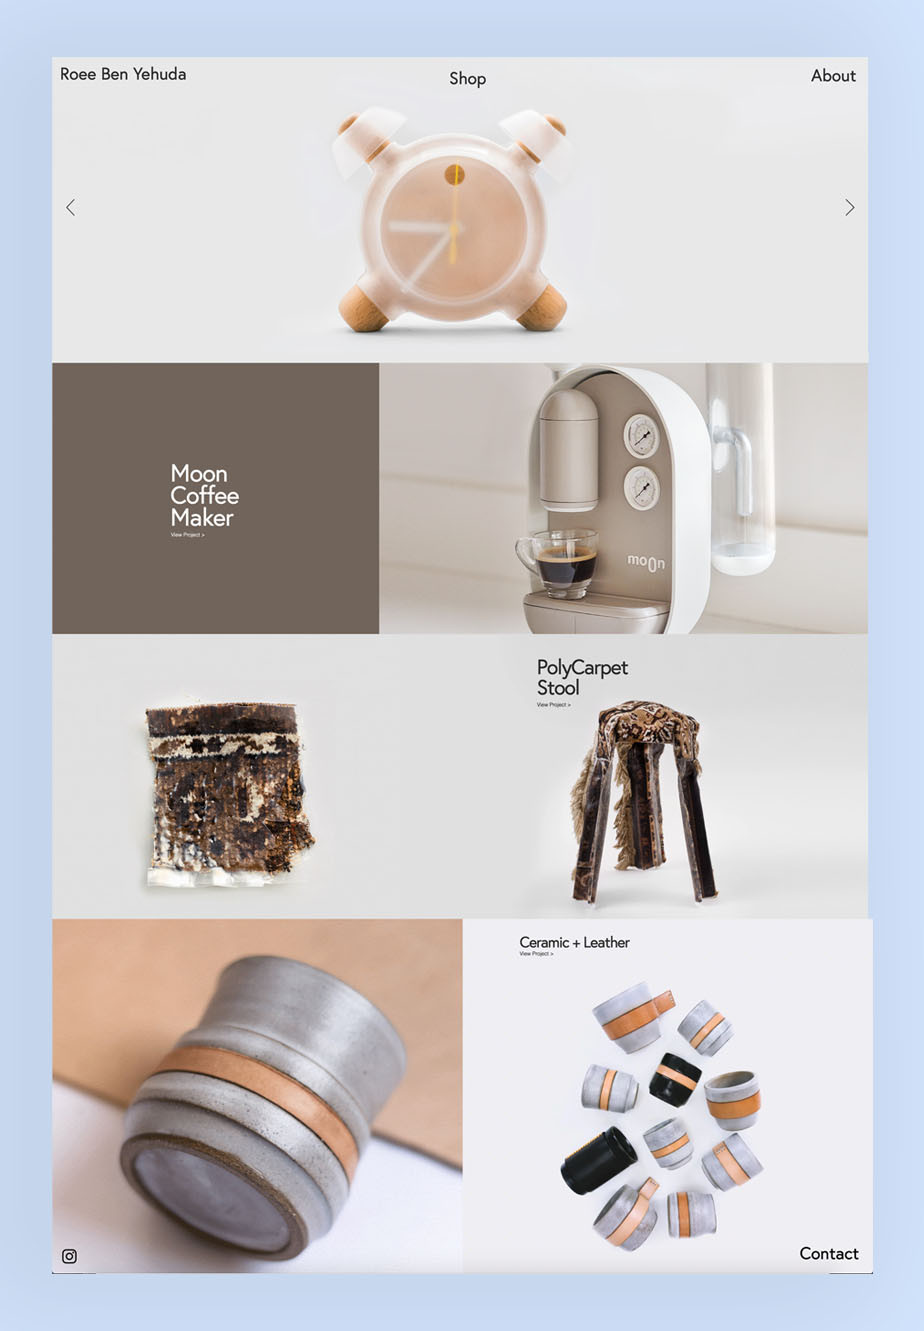 Roee Ben Yehuda portfolio and online store